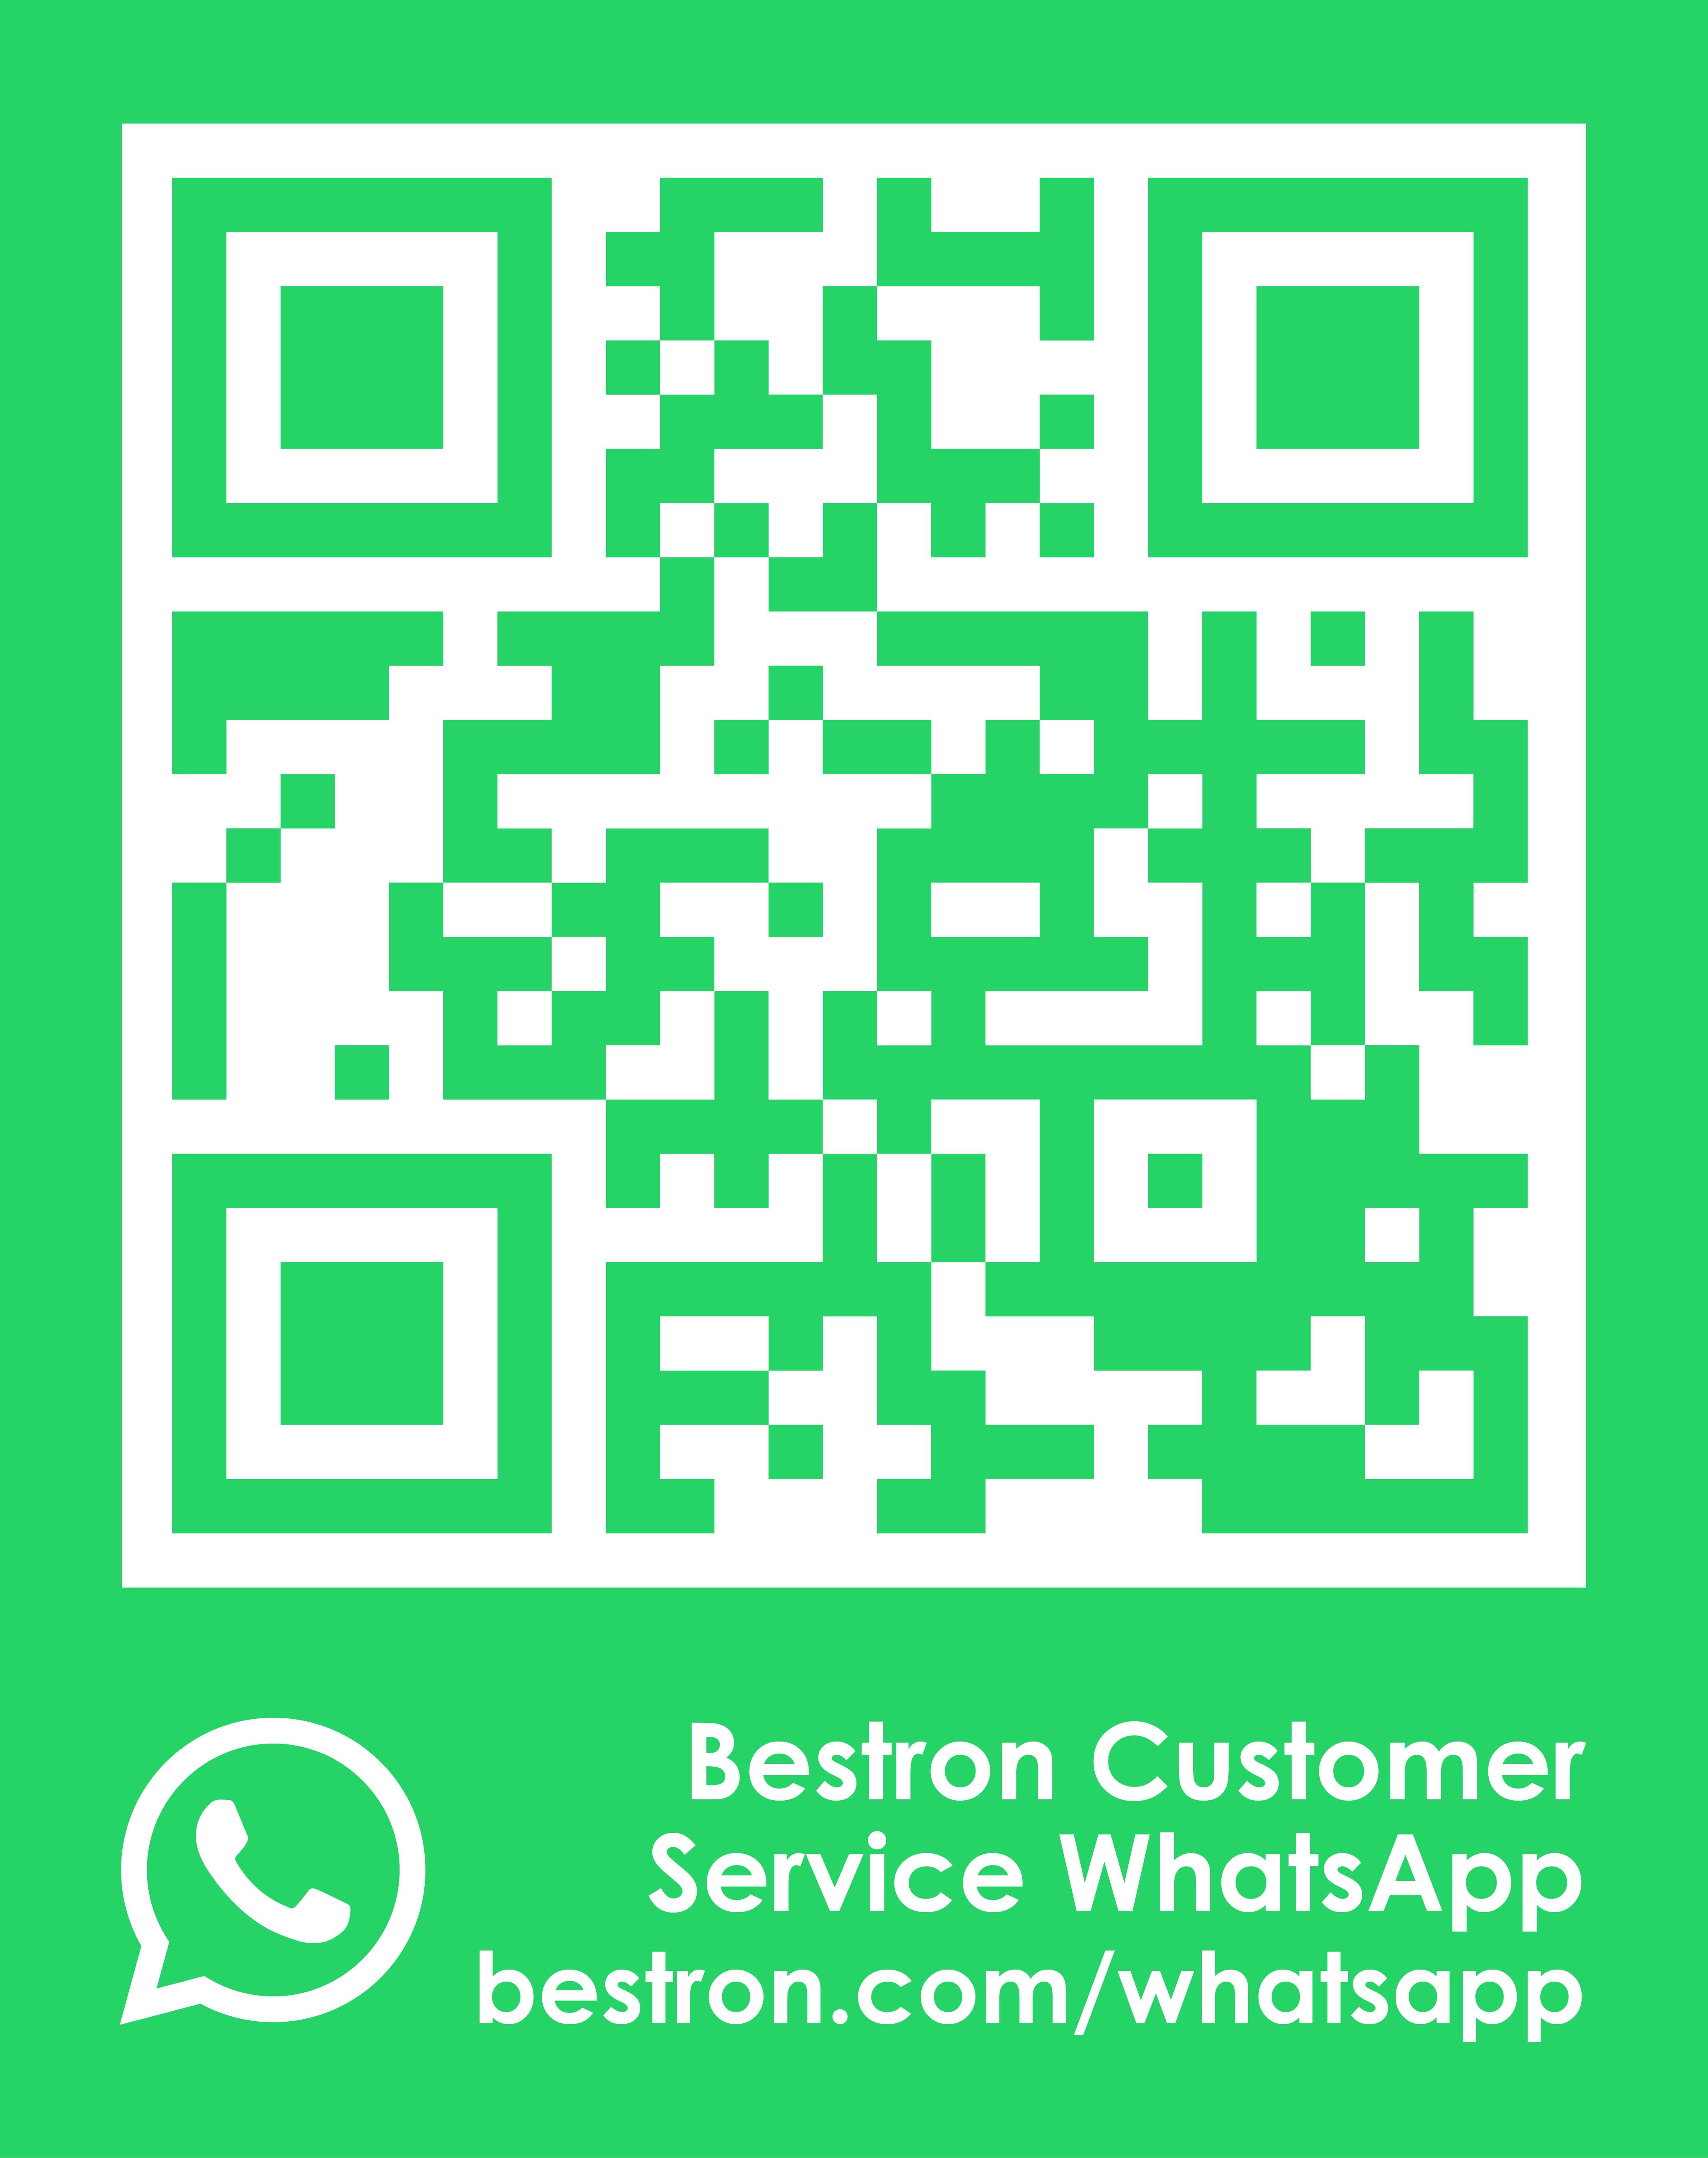 Bestron Customer Service WhatsApp